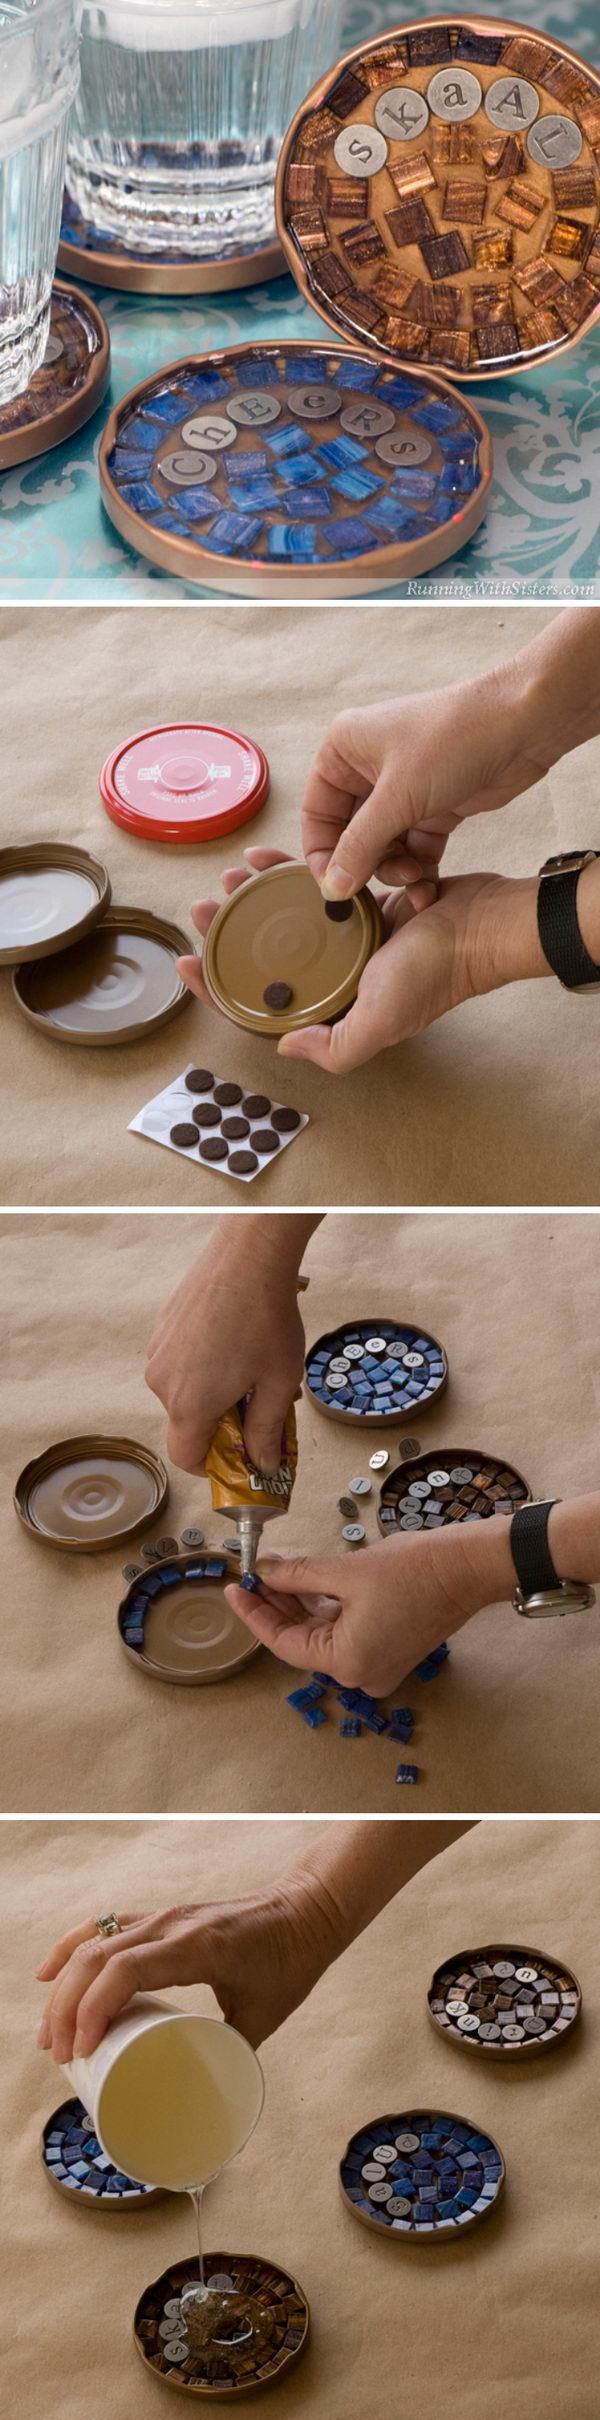 Mosaic Coasters.